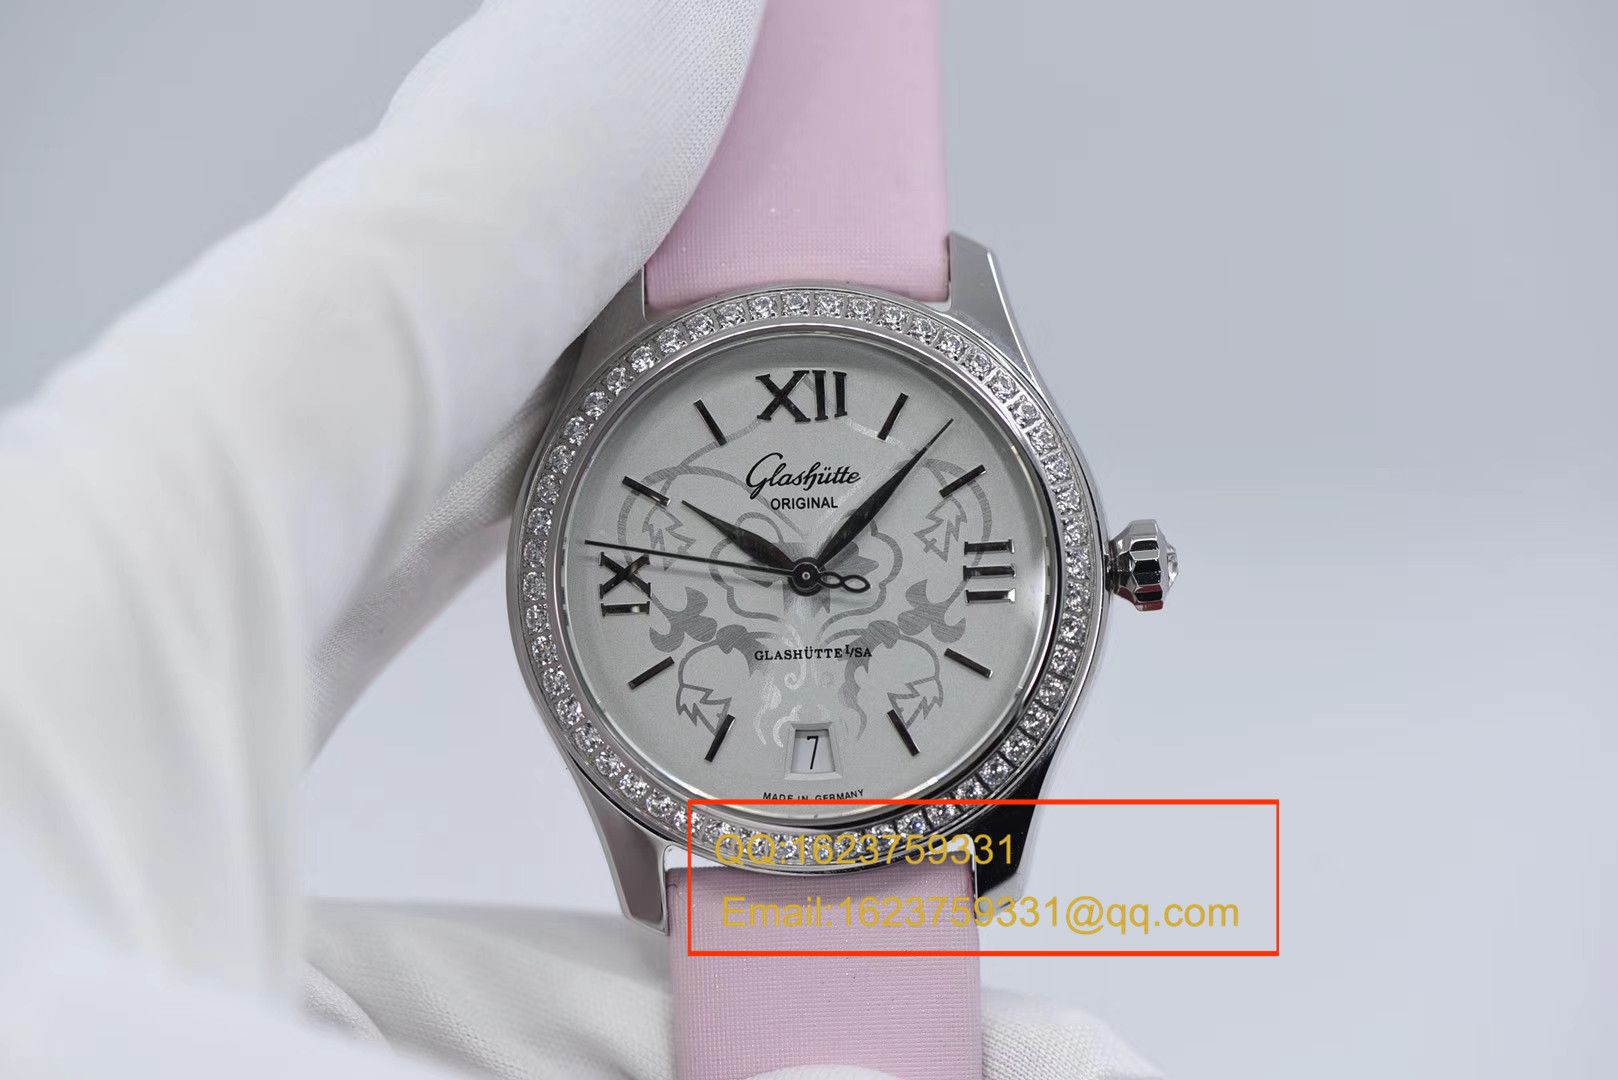 【FK一比一超A精仿女表】格拉苏蒂原创女表系列1-39-22-03-22-44腕表